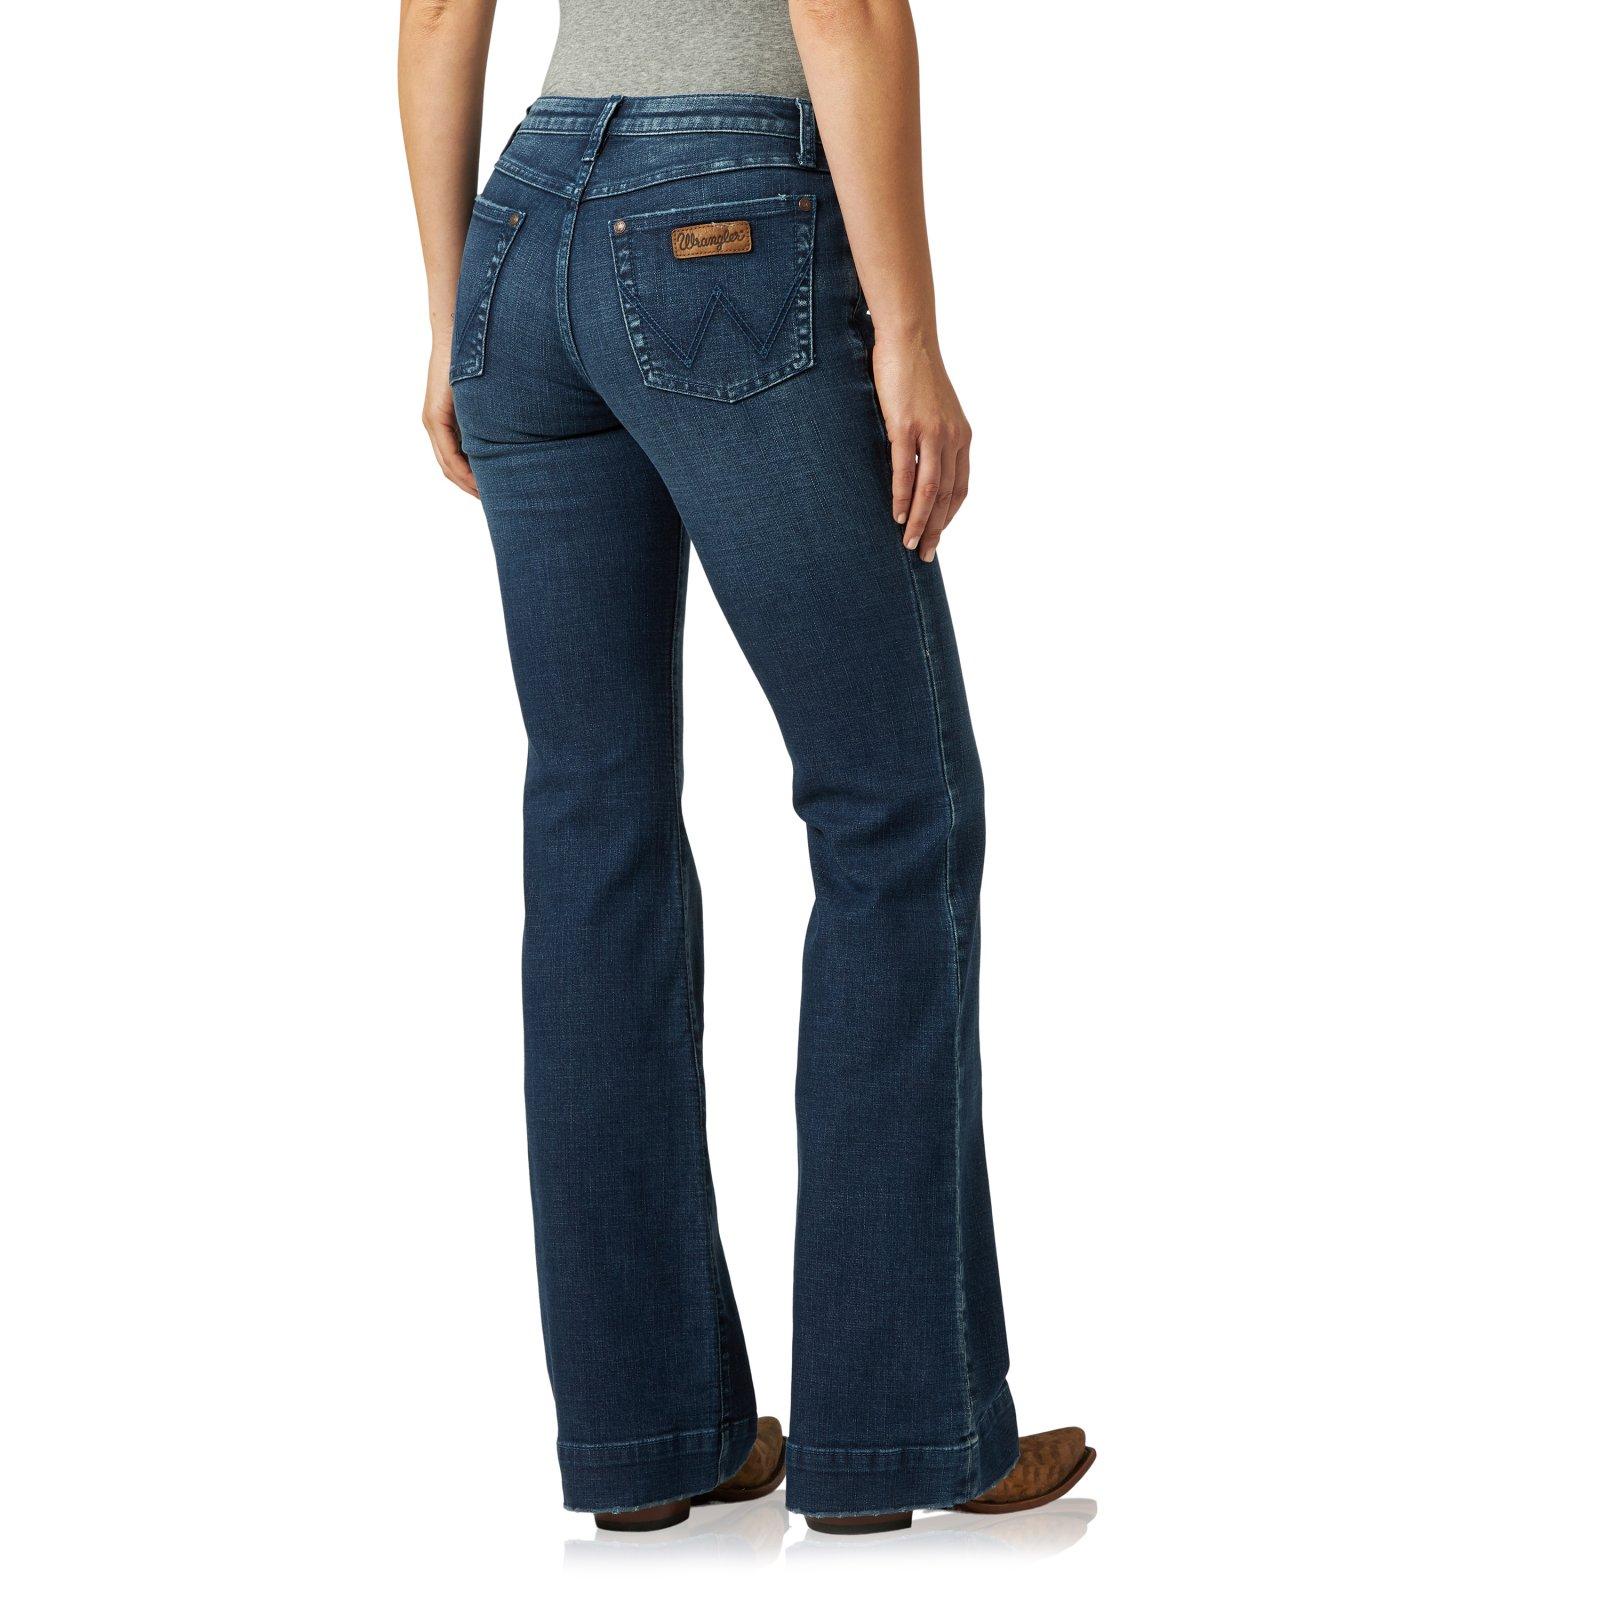 Ladies Retro Mae Sophia Trouser Jean from Wrangler